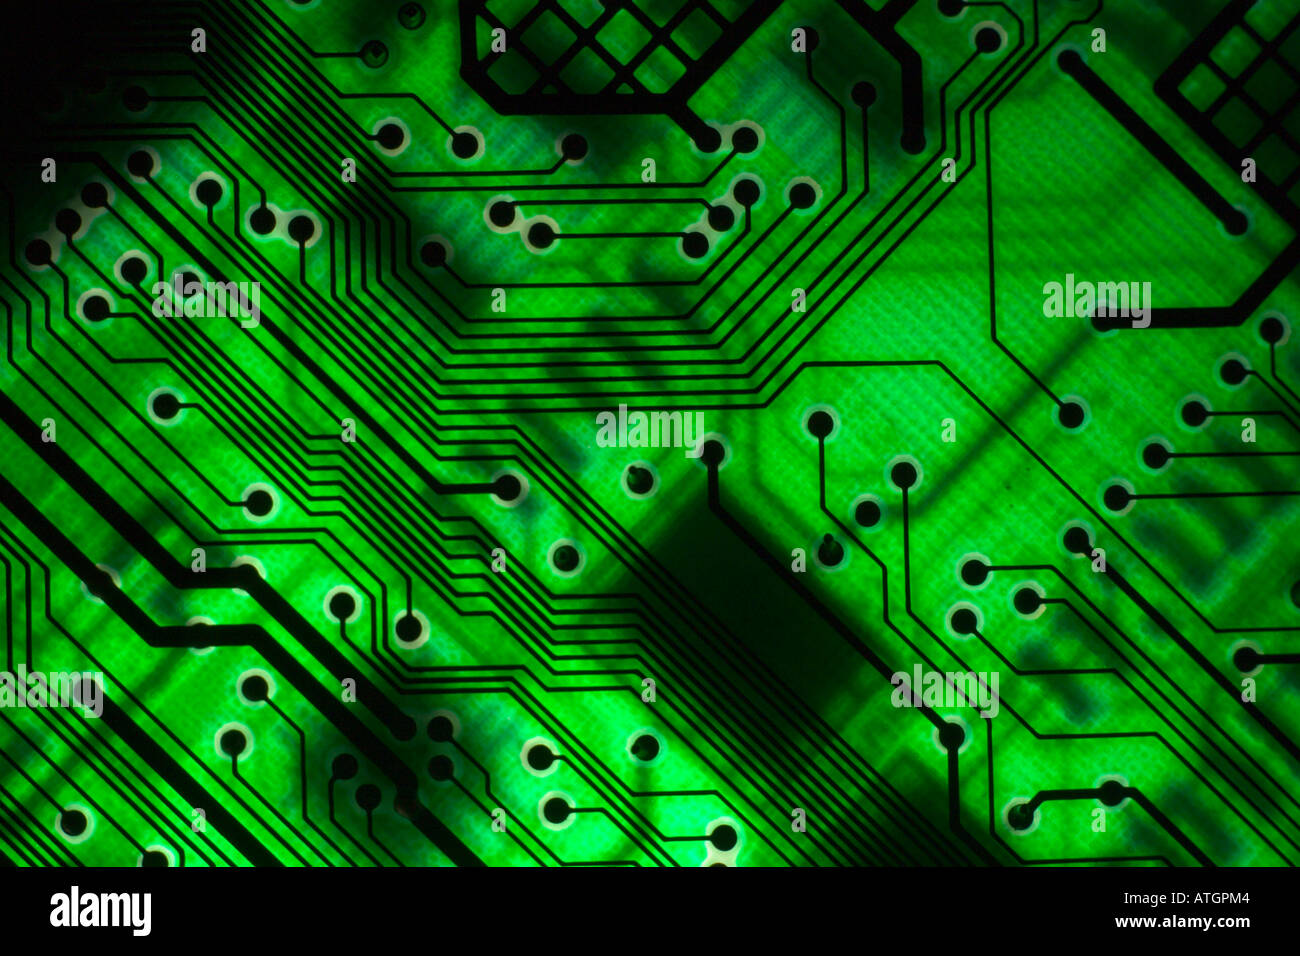 Backlit Electronic Circuit Board Stock Photo 9322691 Alamy Design